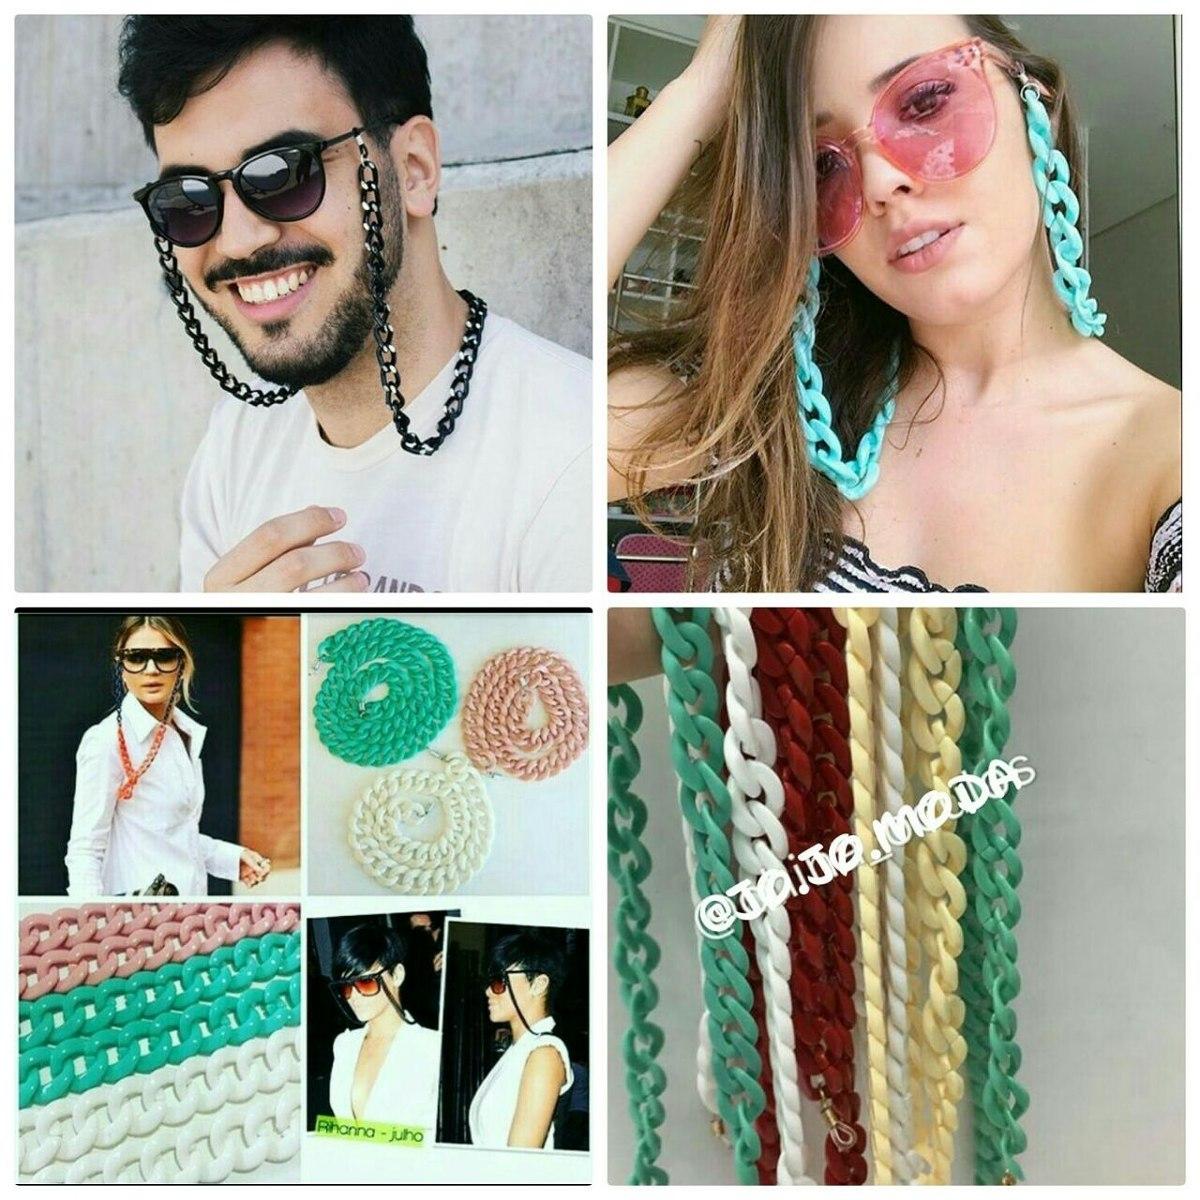 bab79d456 Corrente De Óculos Colar Eló Óculos Lançamento Blogueira - R$ 20,00 ...